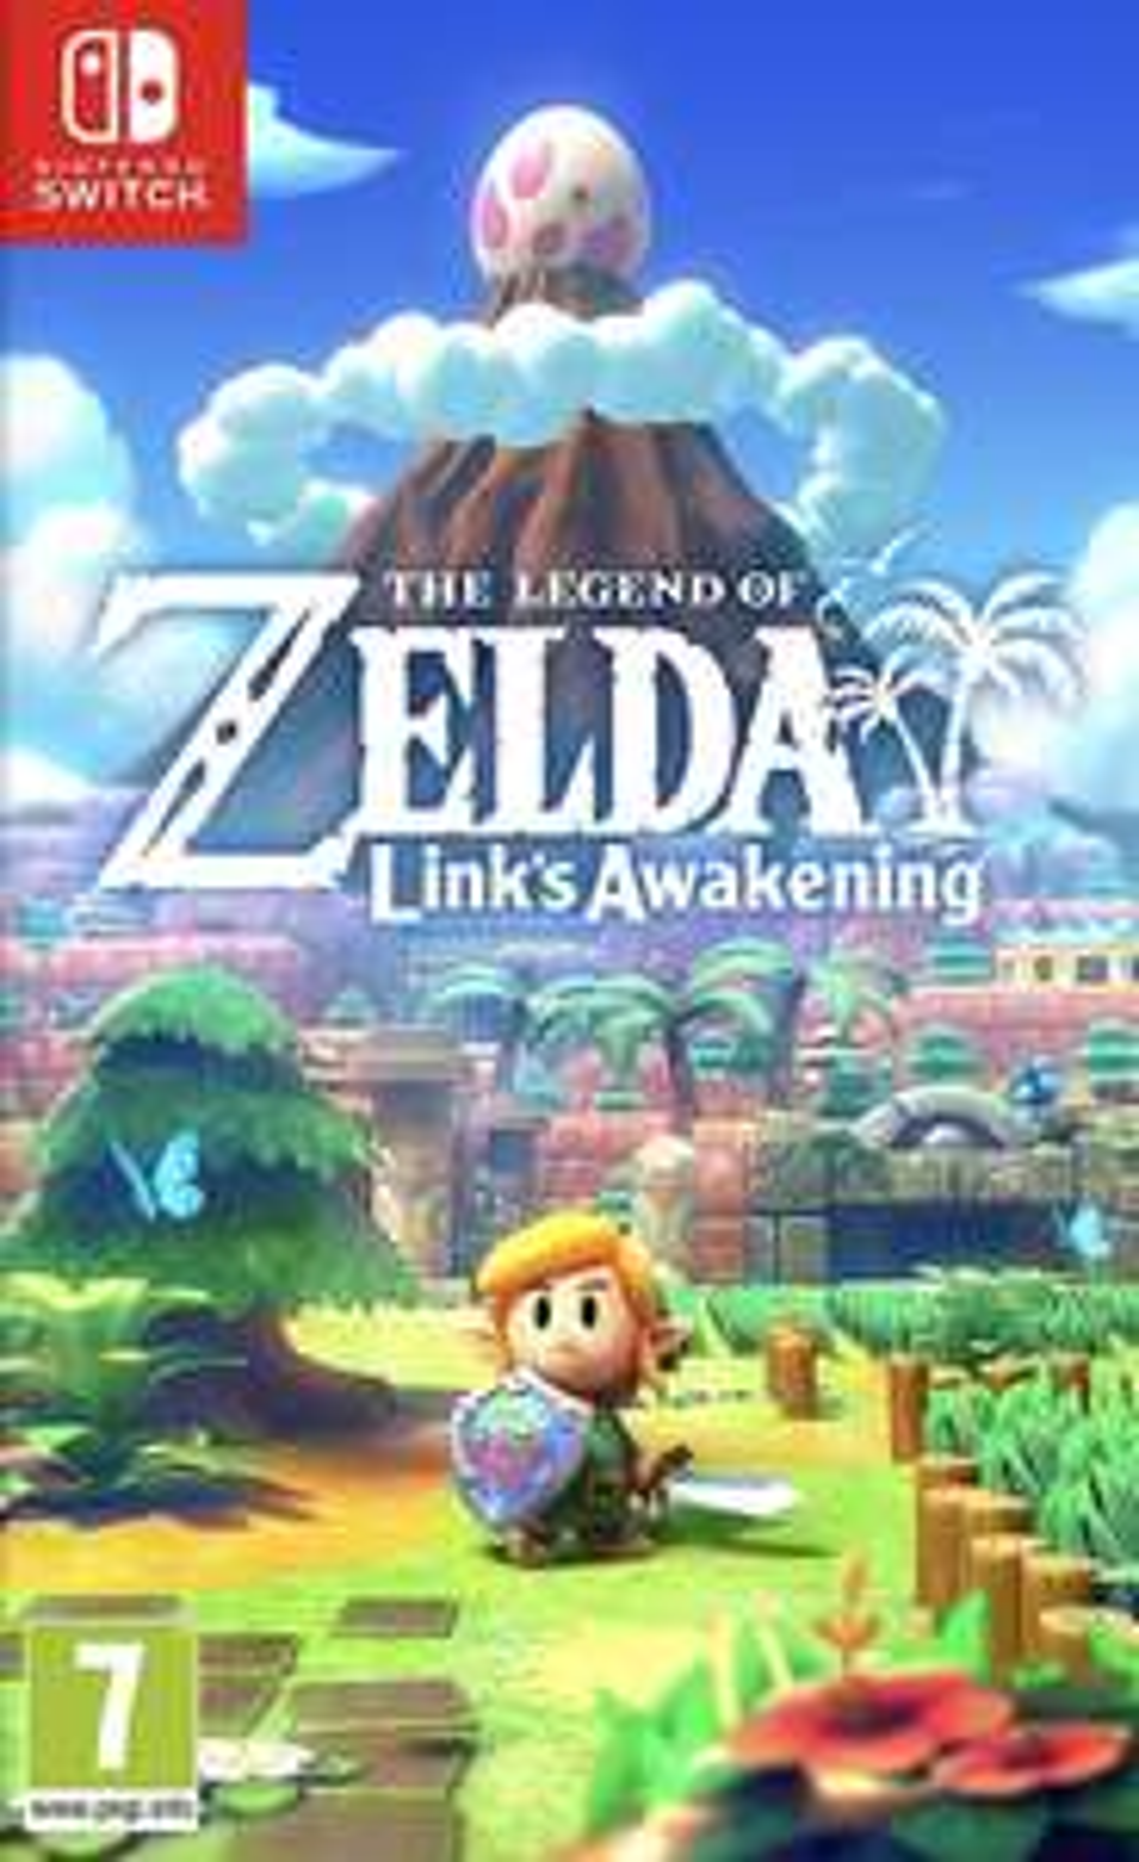 Legend of Zelda Link's Awakening ( Nintendo Switch) @ TheGameCollection via eBay